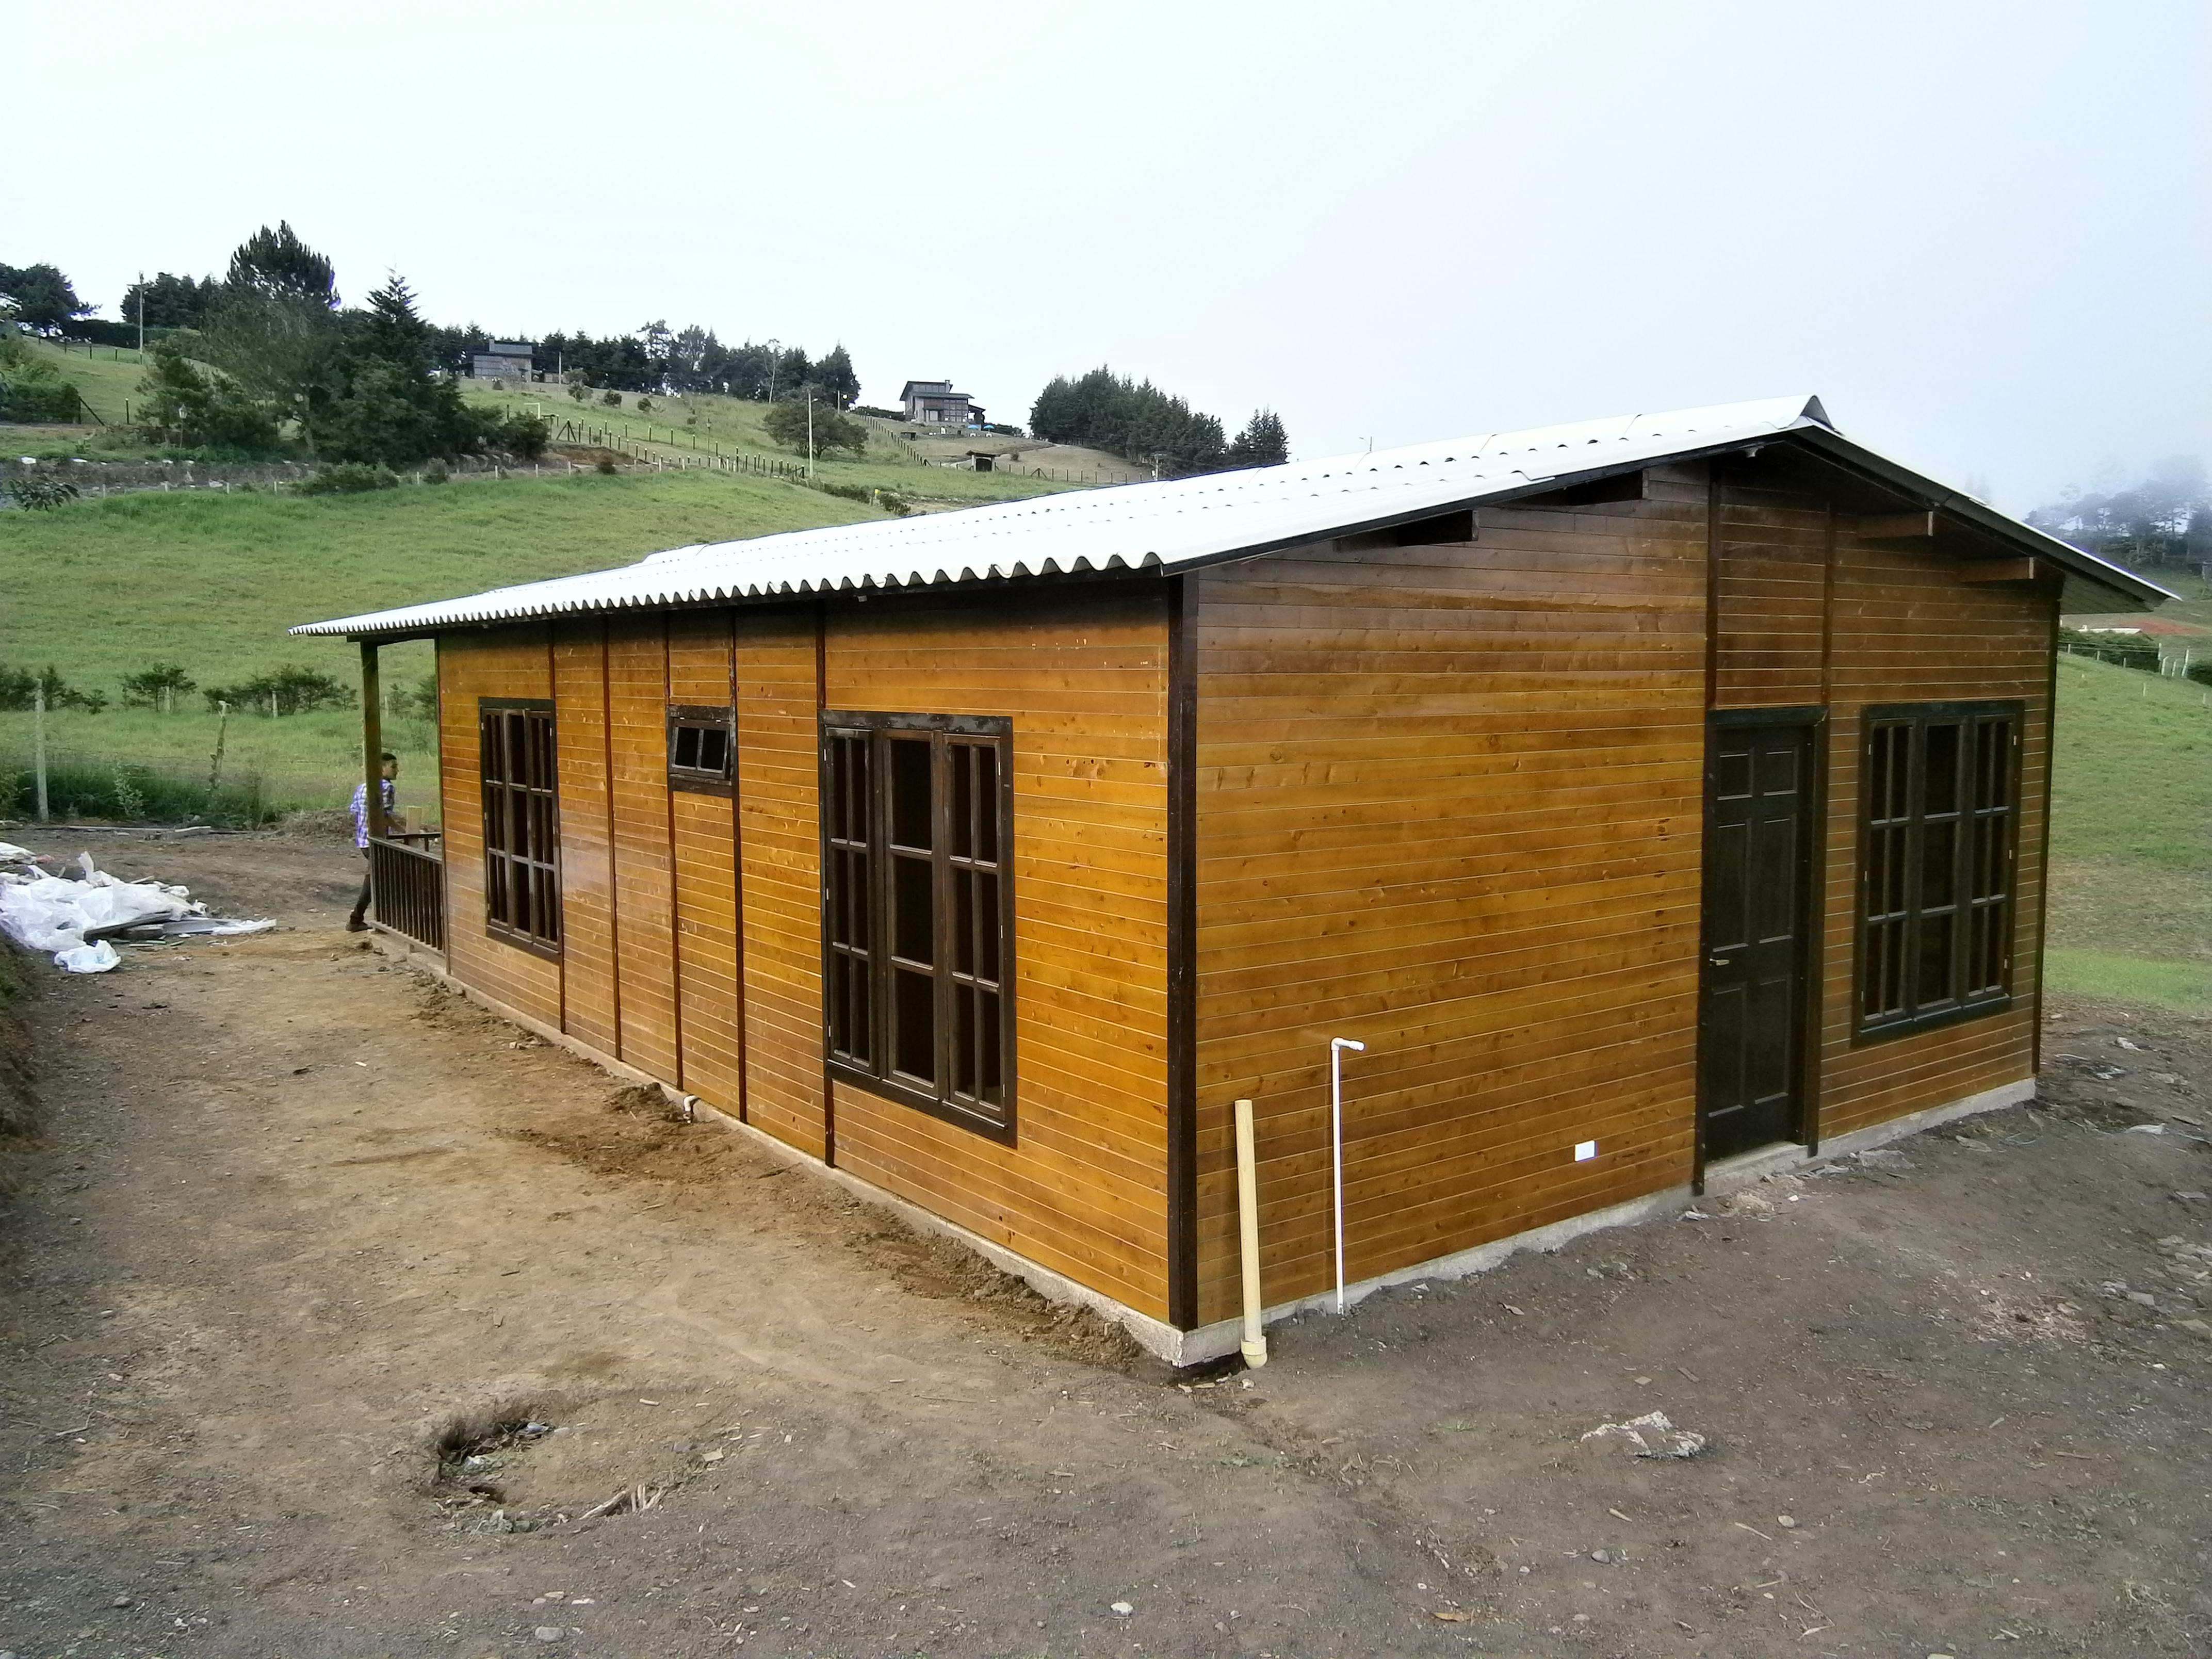 casas prefabricadas 1 0 600 0 m2 per month